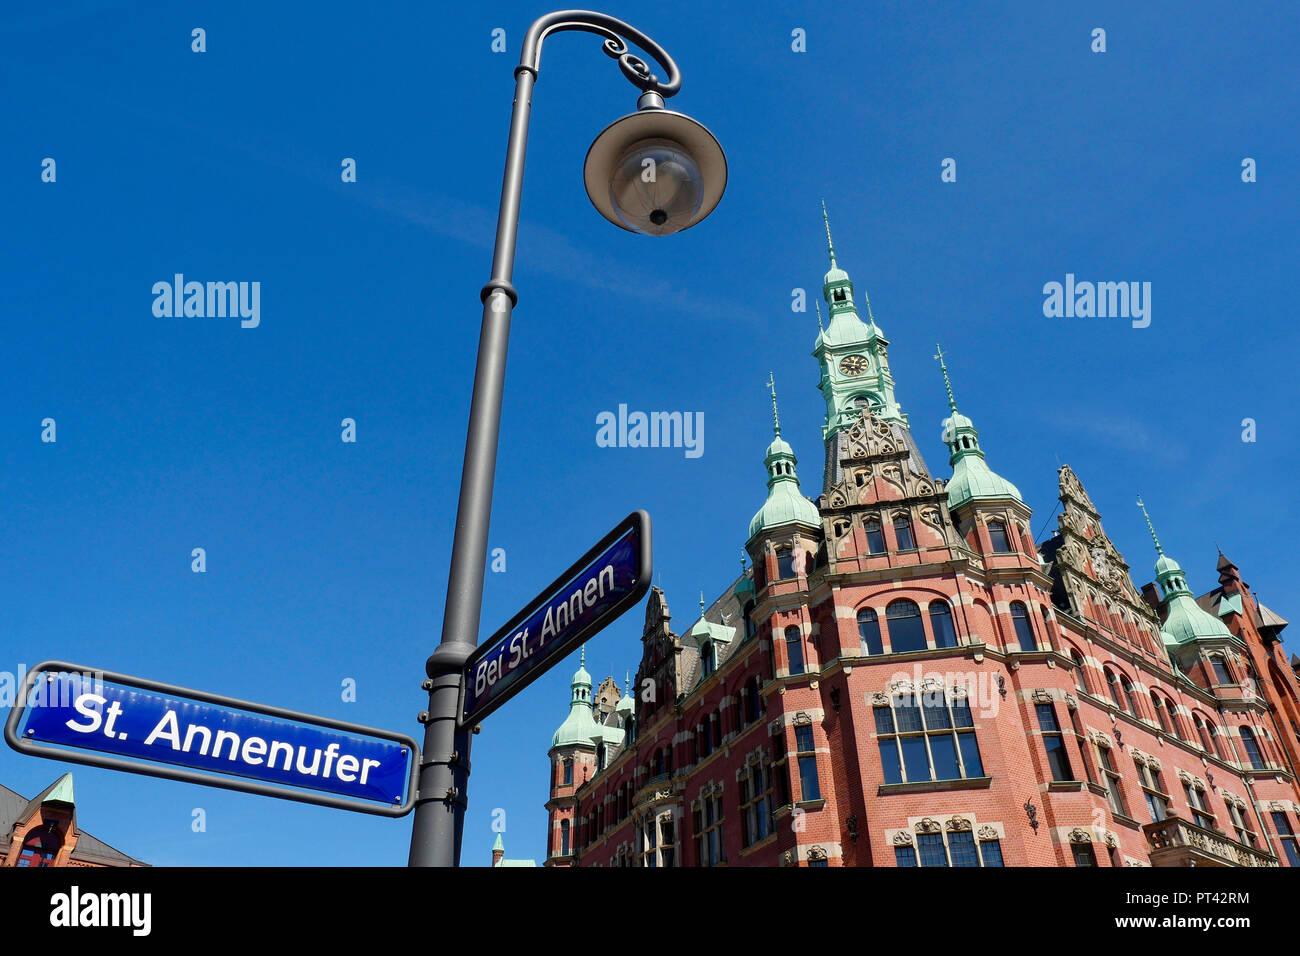 HHLA Hamburger Hafen Logistics Headquarters, near Saint Annen, warehouse district, Hamburg, Germany - Stock Image